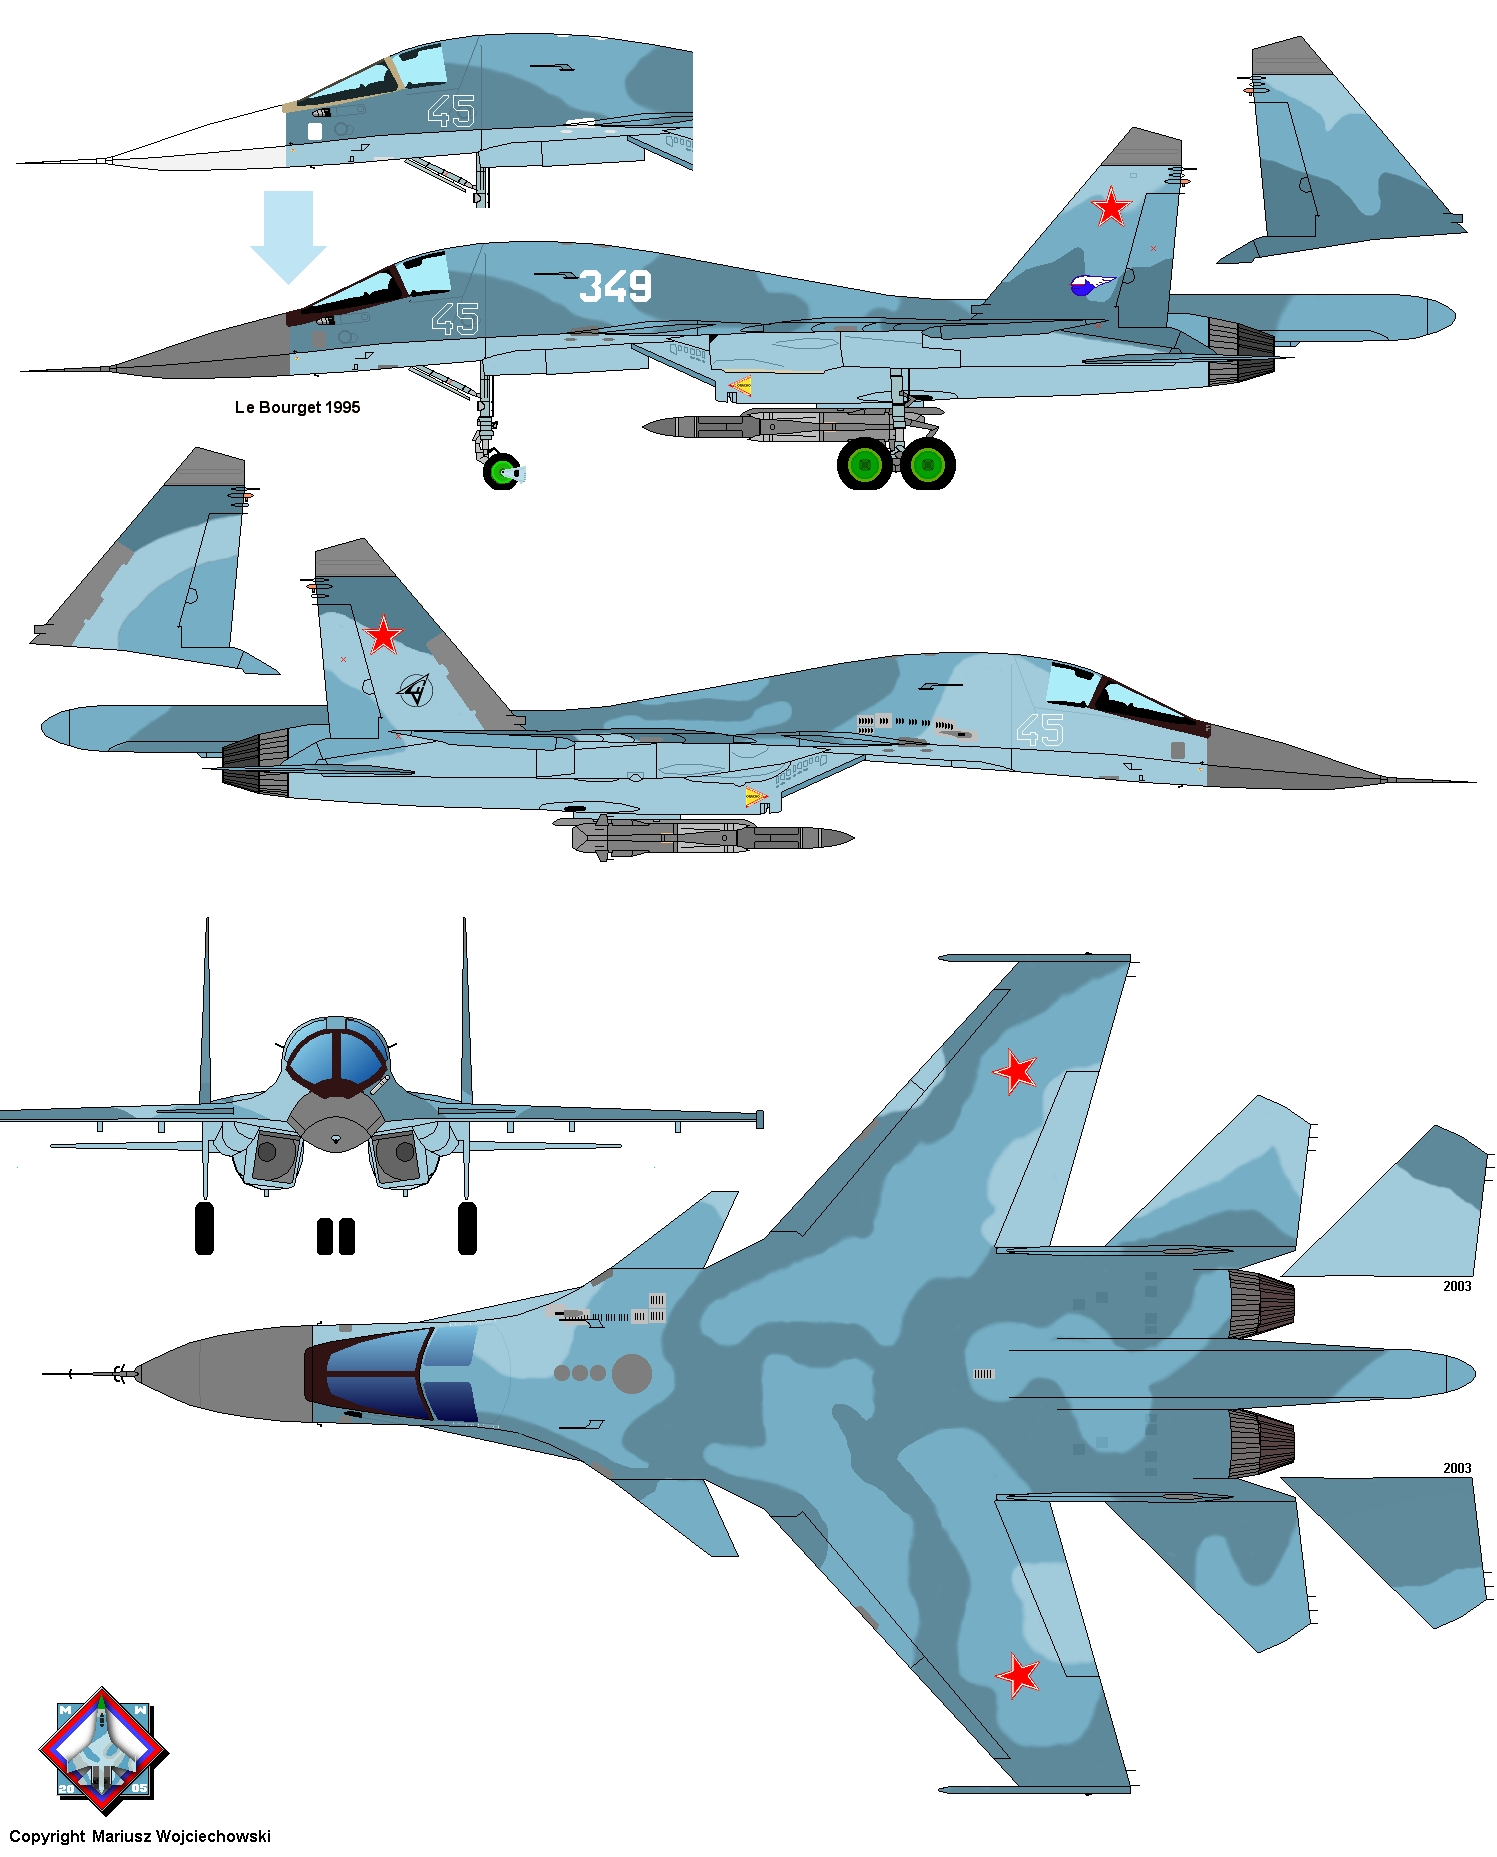 Sukhoi Su-30 Story In Colours. Sukhoi Su-30 Fighter